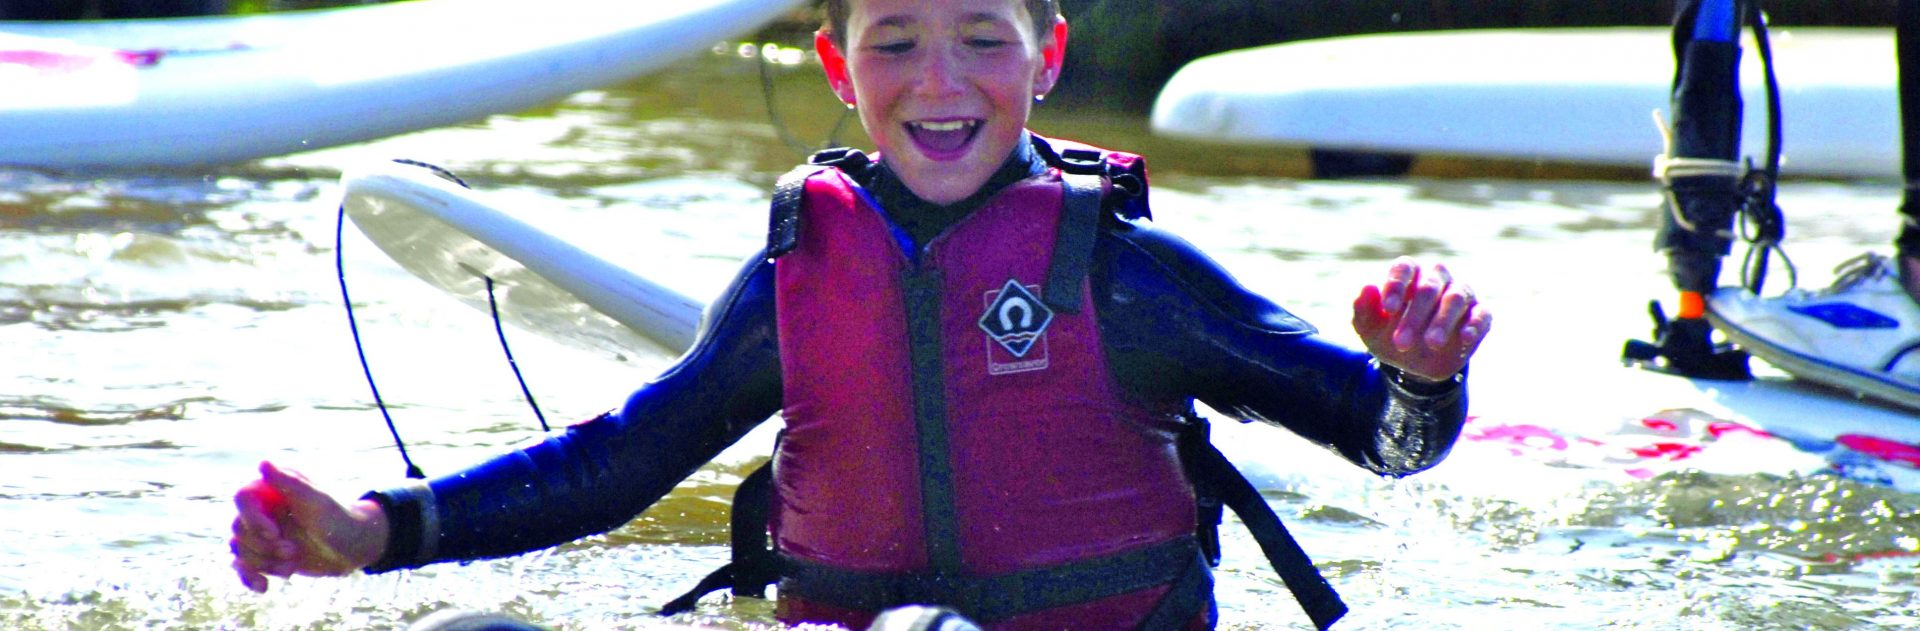 Child windsurfing